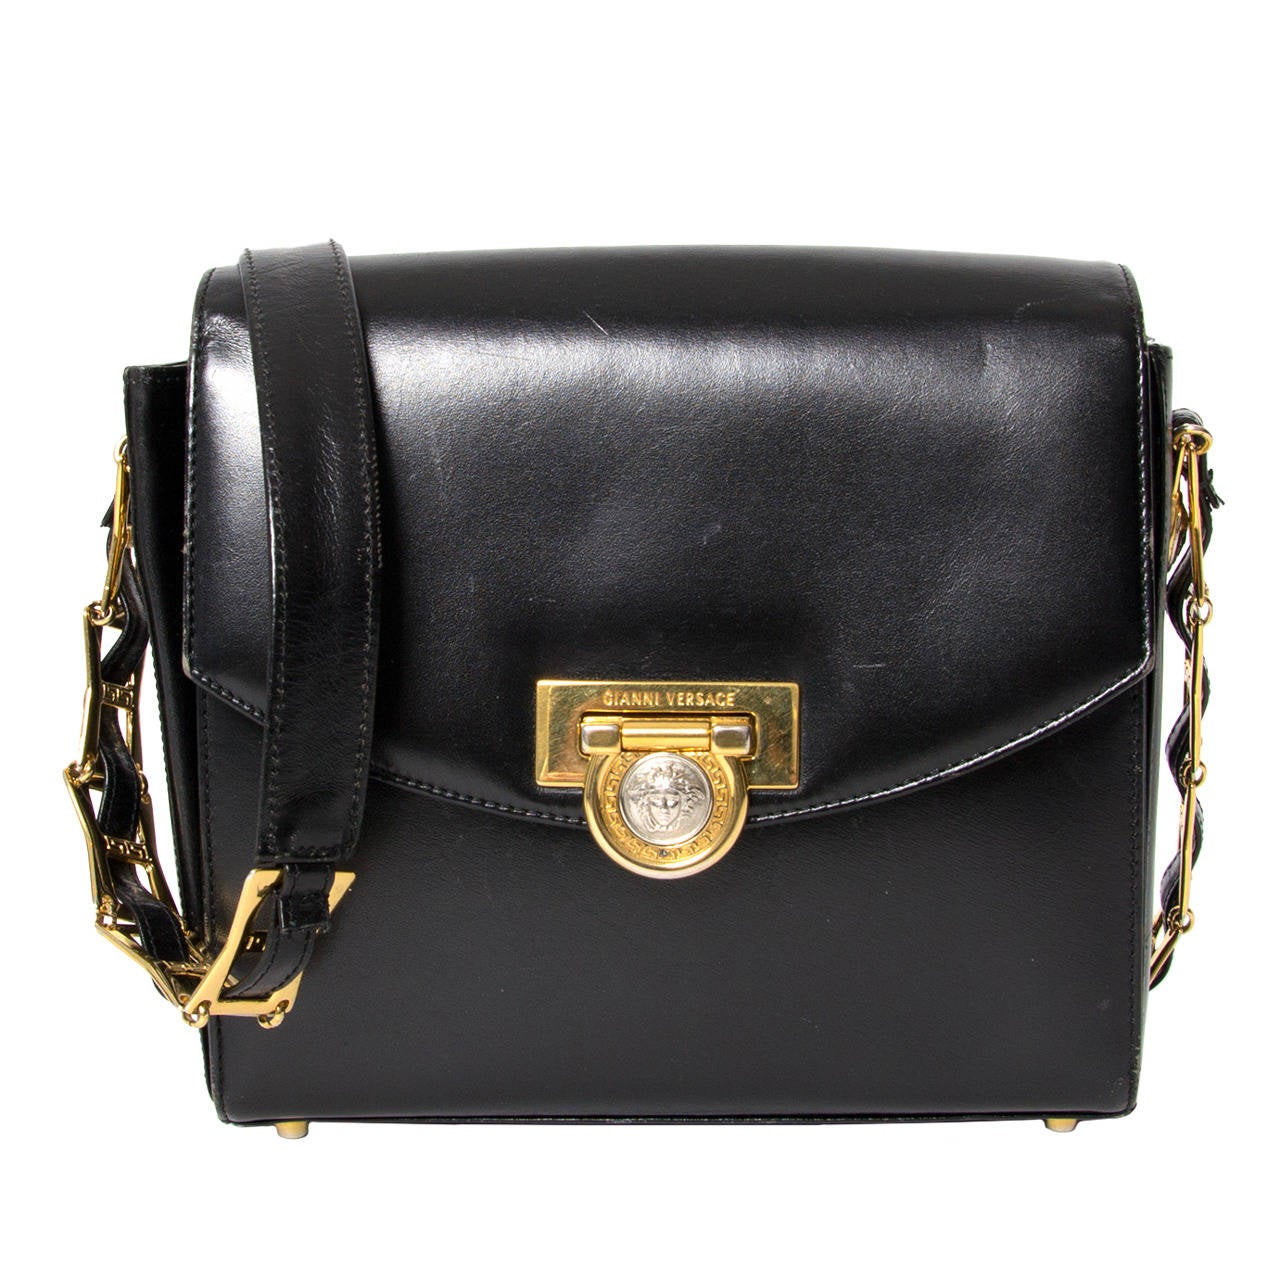 Gianni Versace Black Leather Medusa Handbag at 1stdibs 85867d9ad7bdd